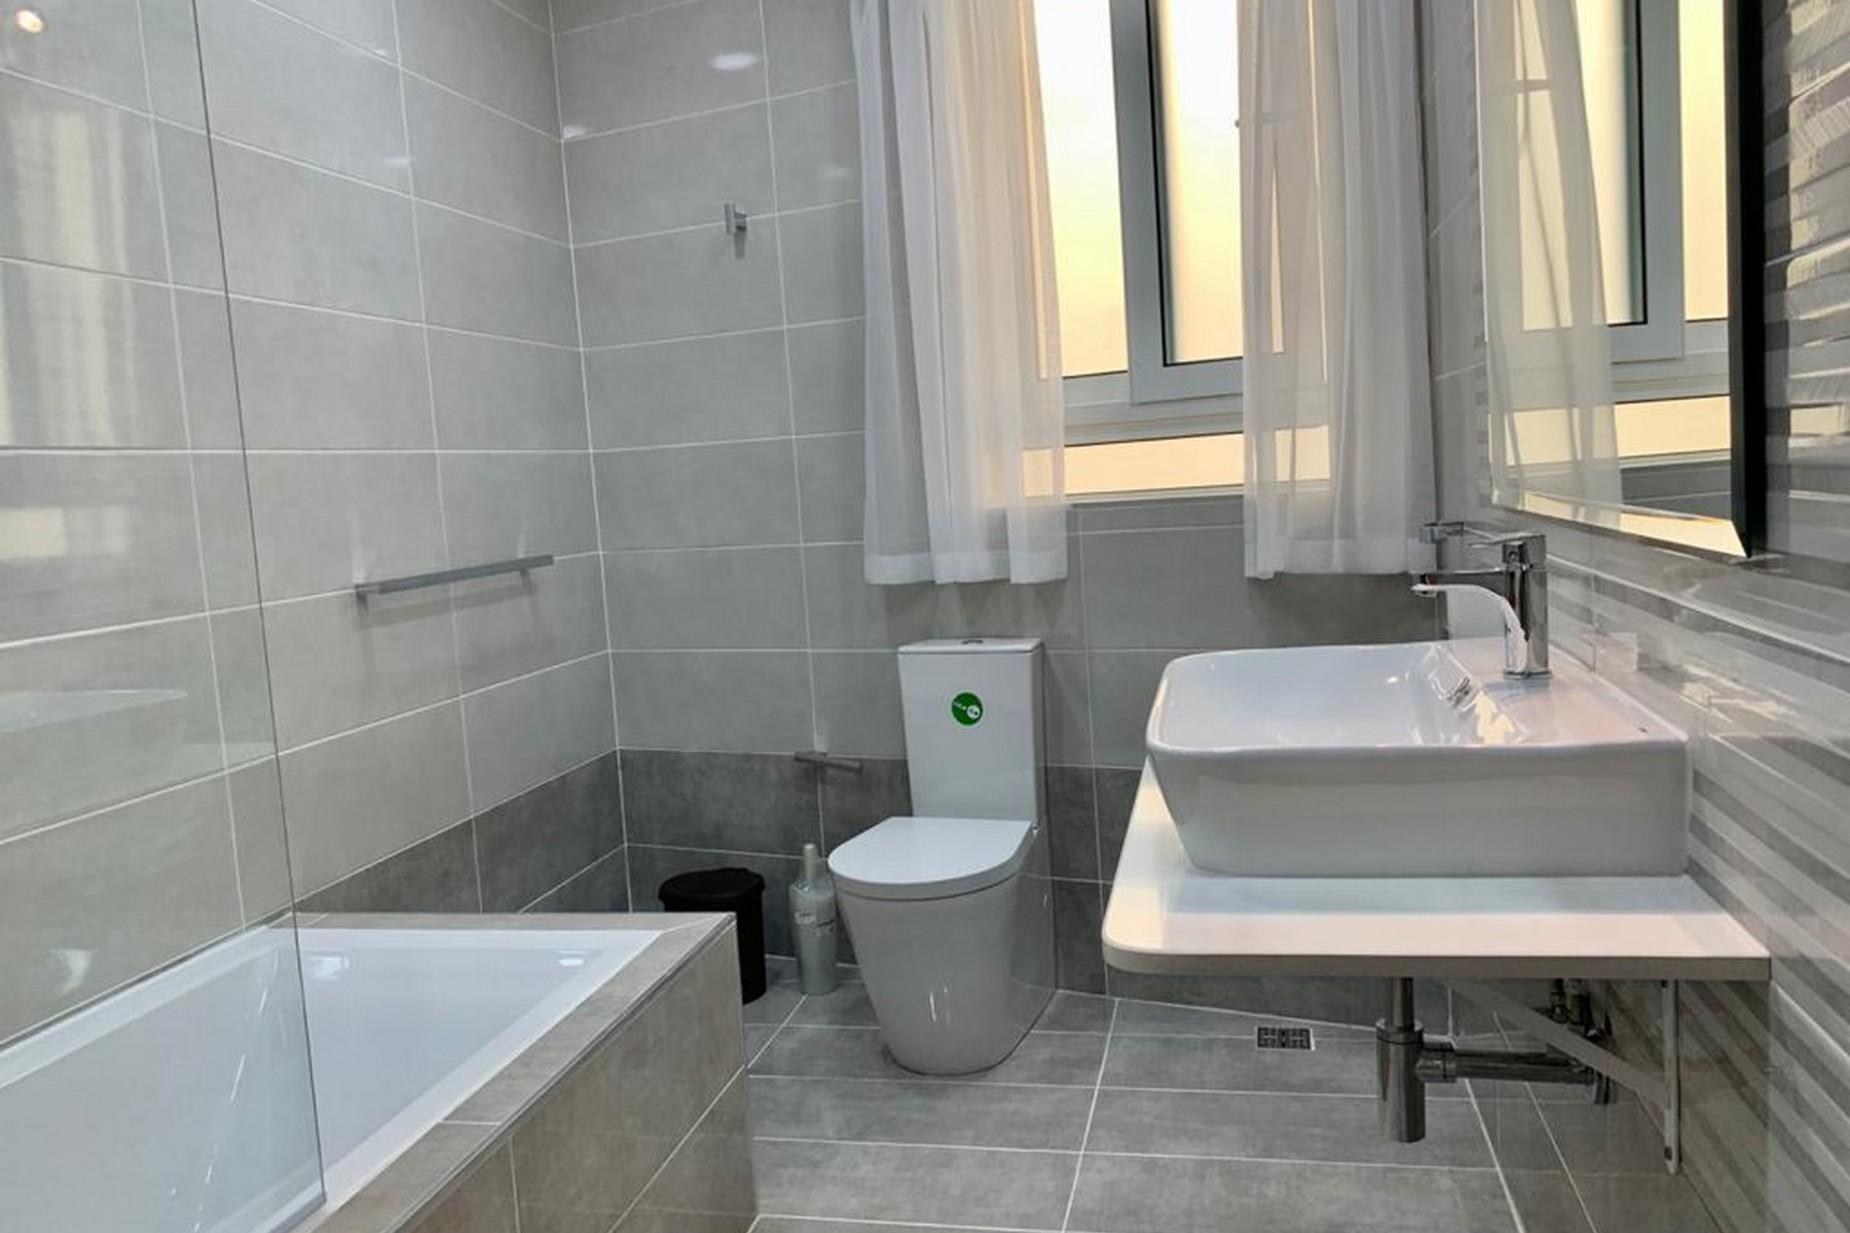 3 bed Apartment For Rent in Sliema, Sliema - thumb 19